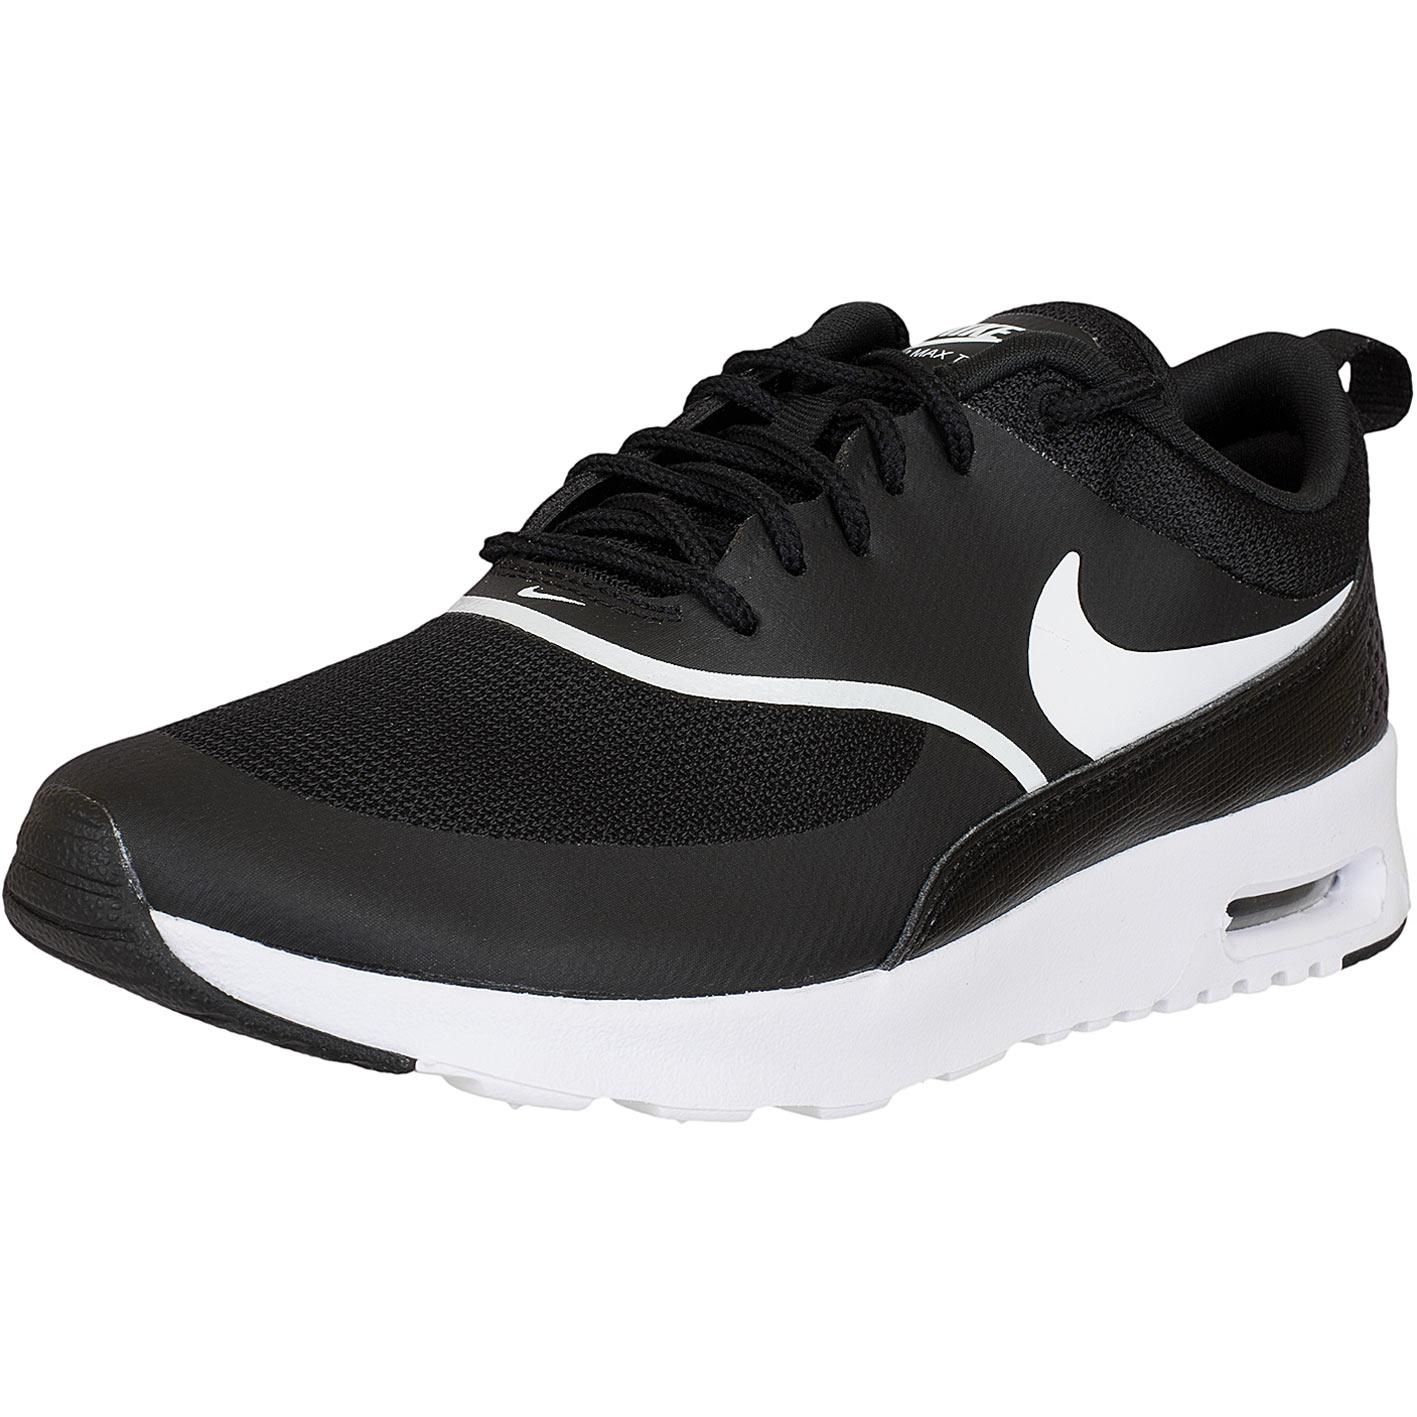 ☆ Nike Damen Sneaker Air Max Thea schwarz/weiß - hier bestellen!